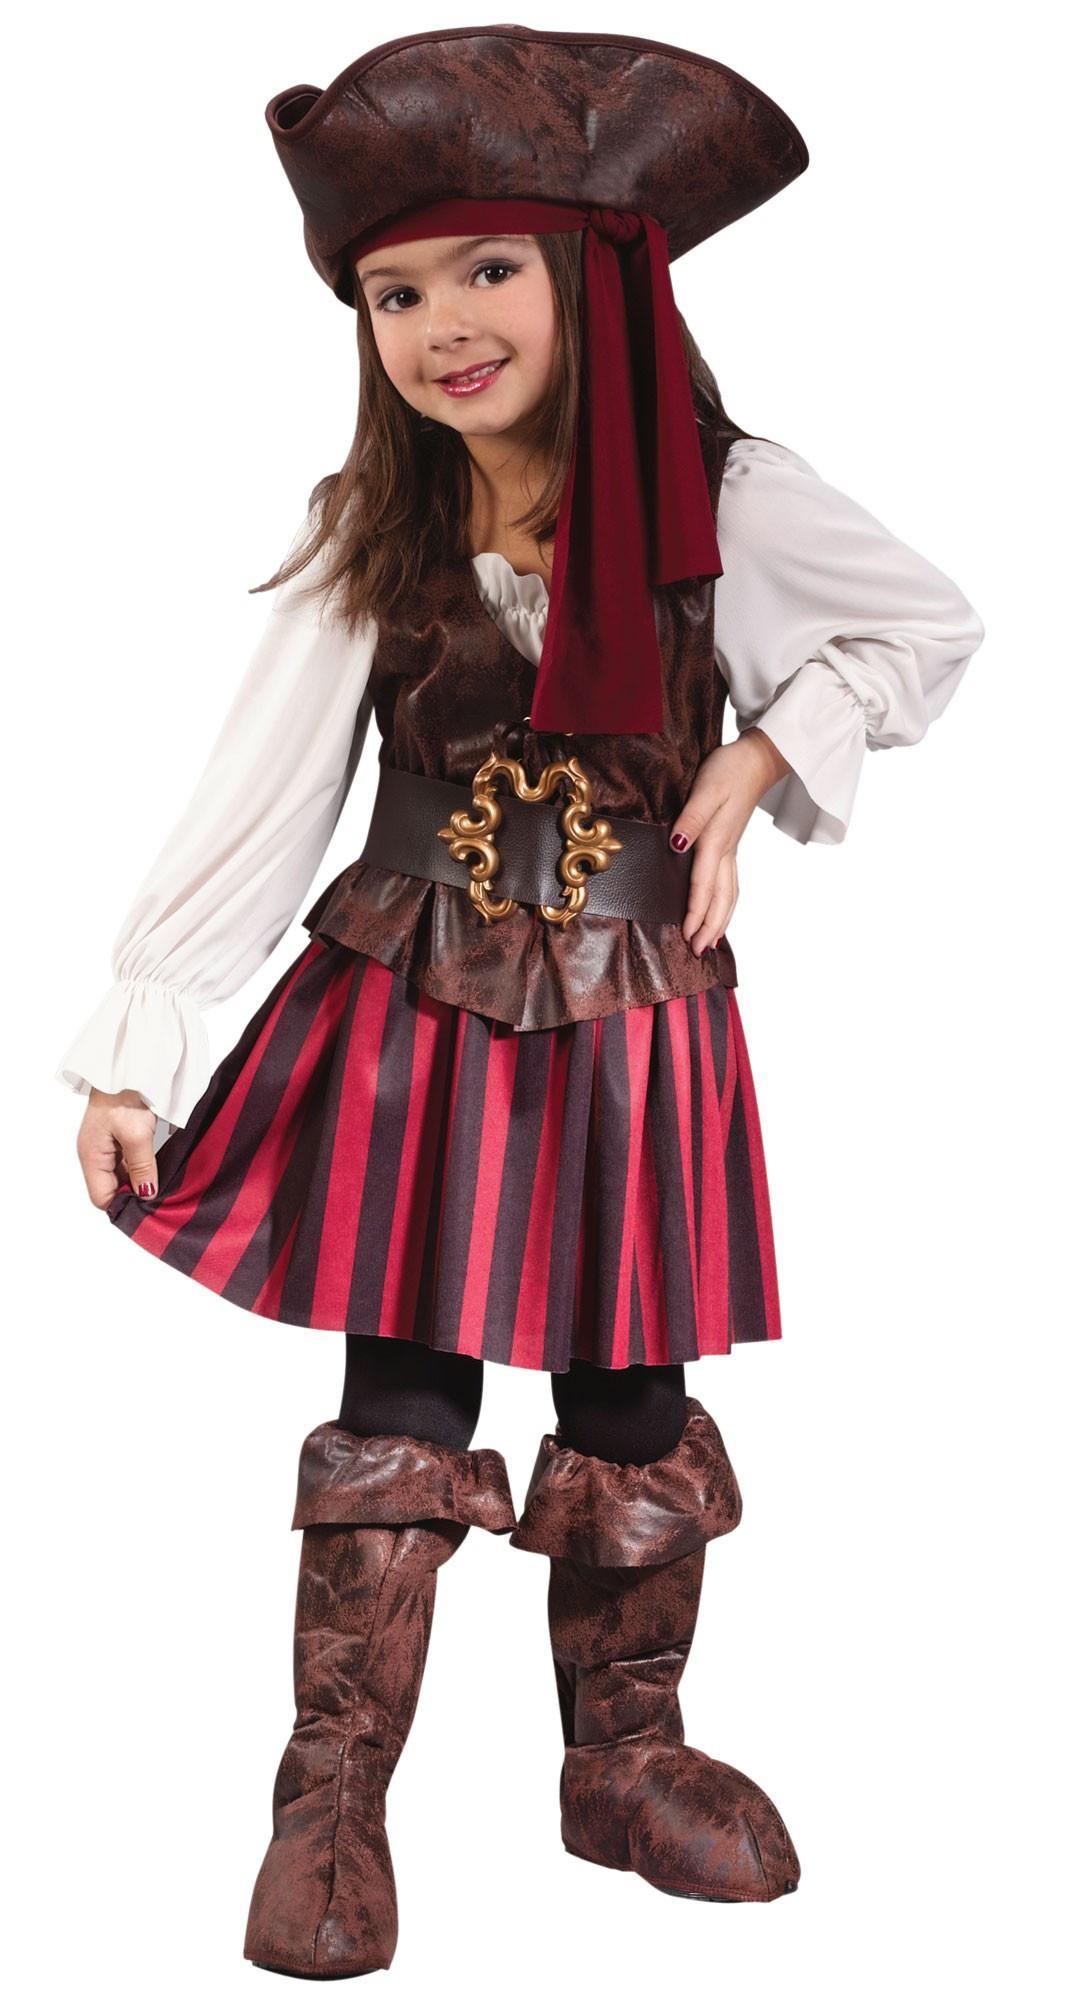 Kids High Seas Toddler Pirate Costume - Mr. Costumes